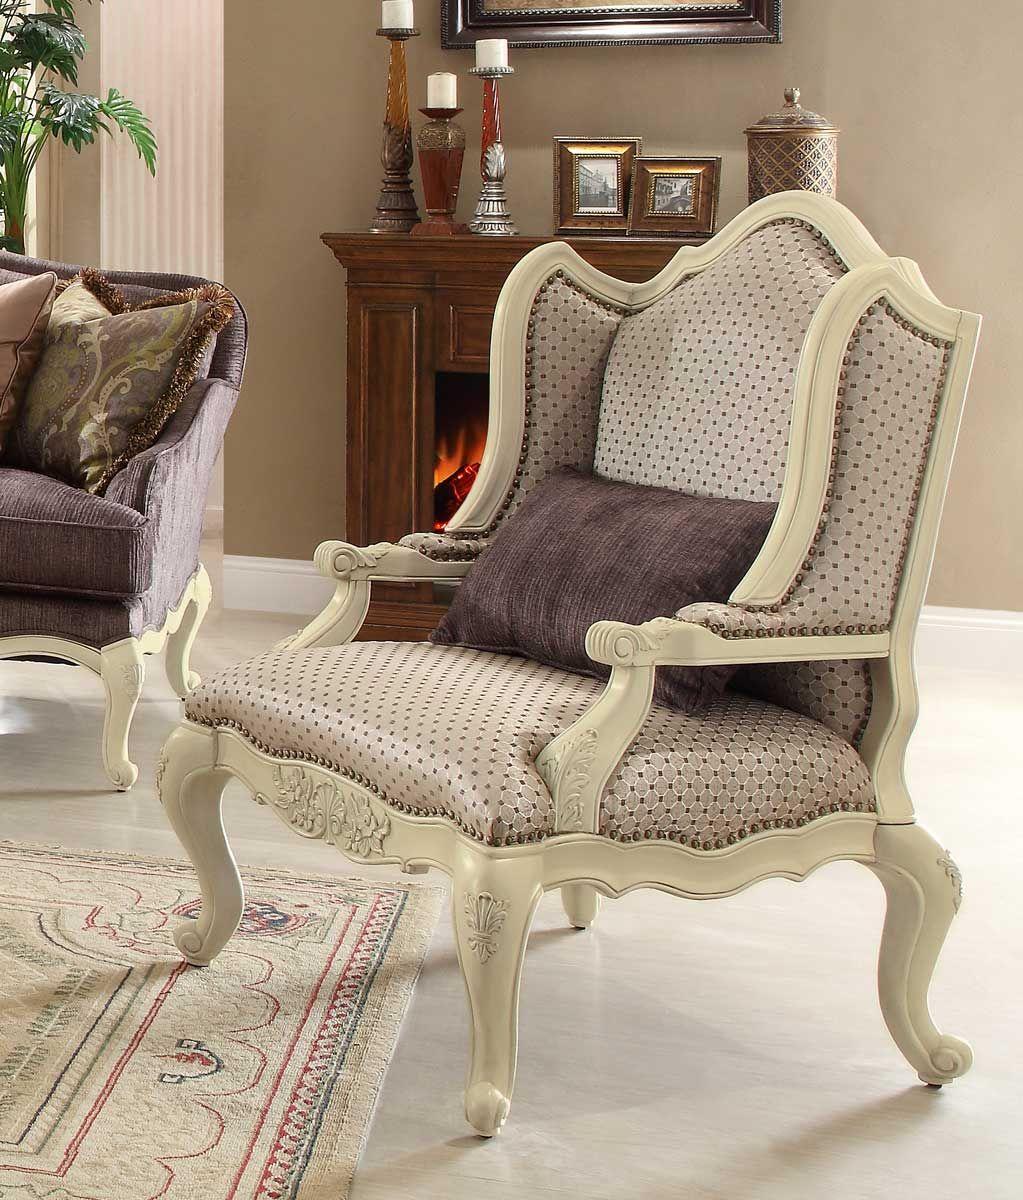 Beautiful Homelegance Casanova II Accent Chair   Antique White Price : $934.00